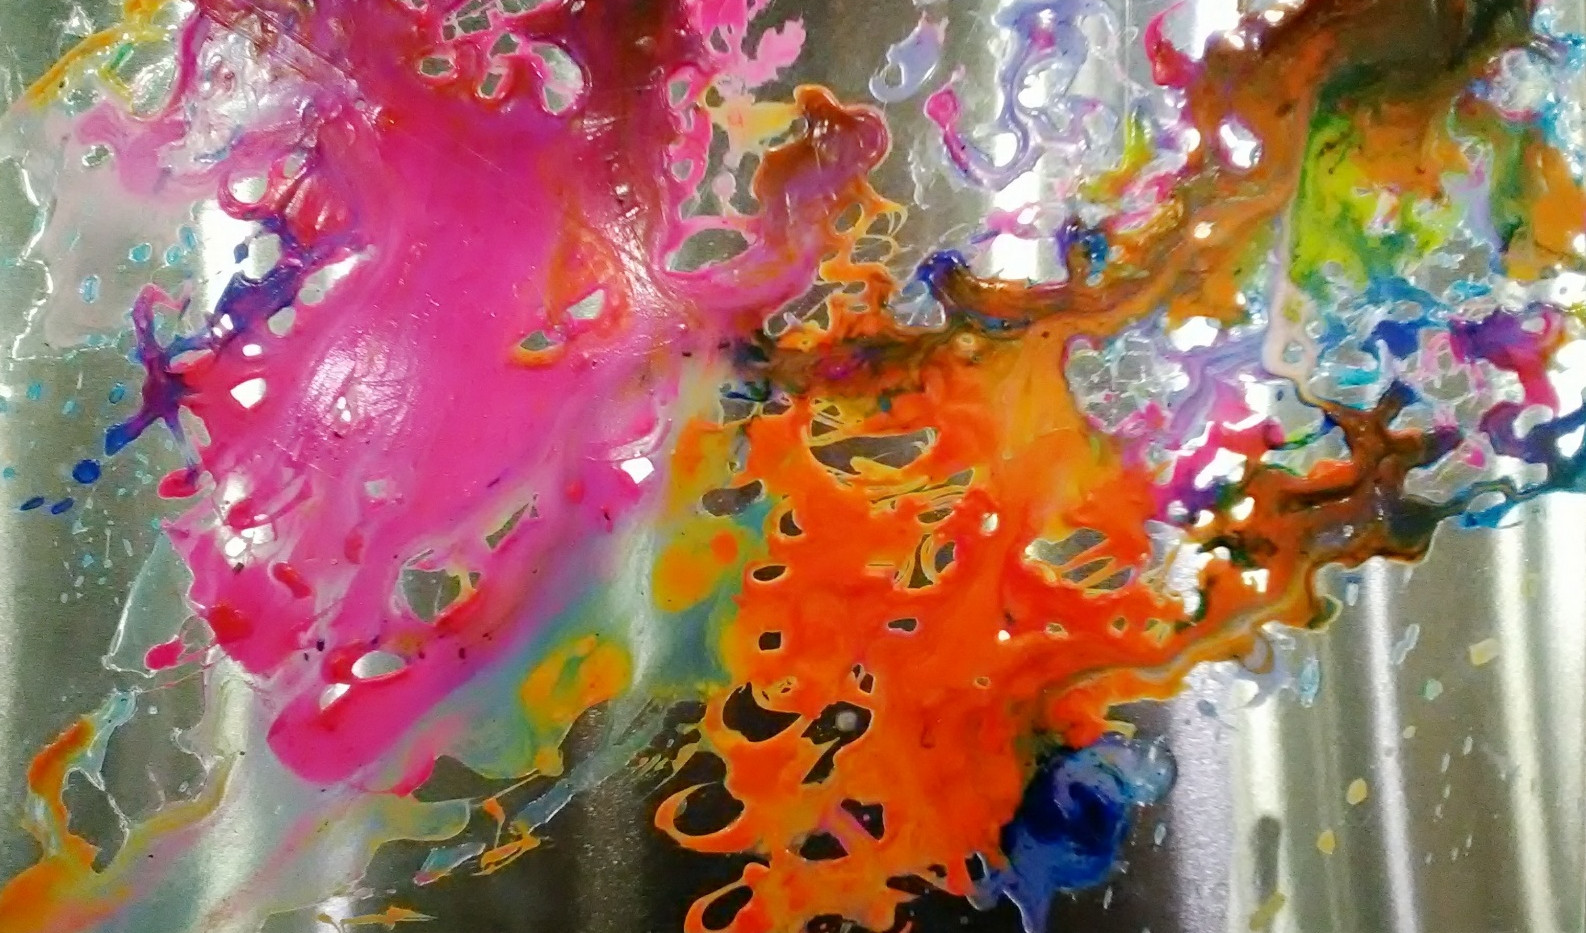 #1_acrylic painting on aluminum board